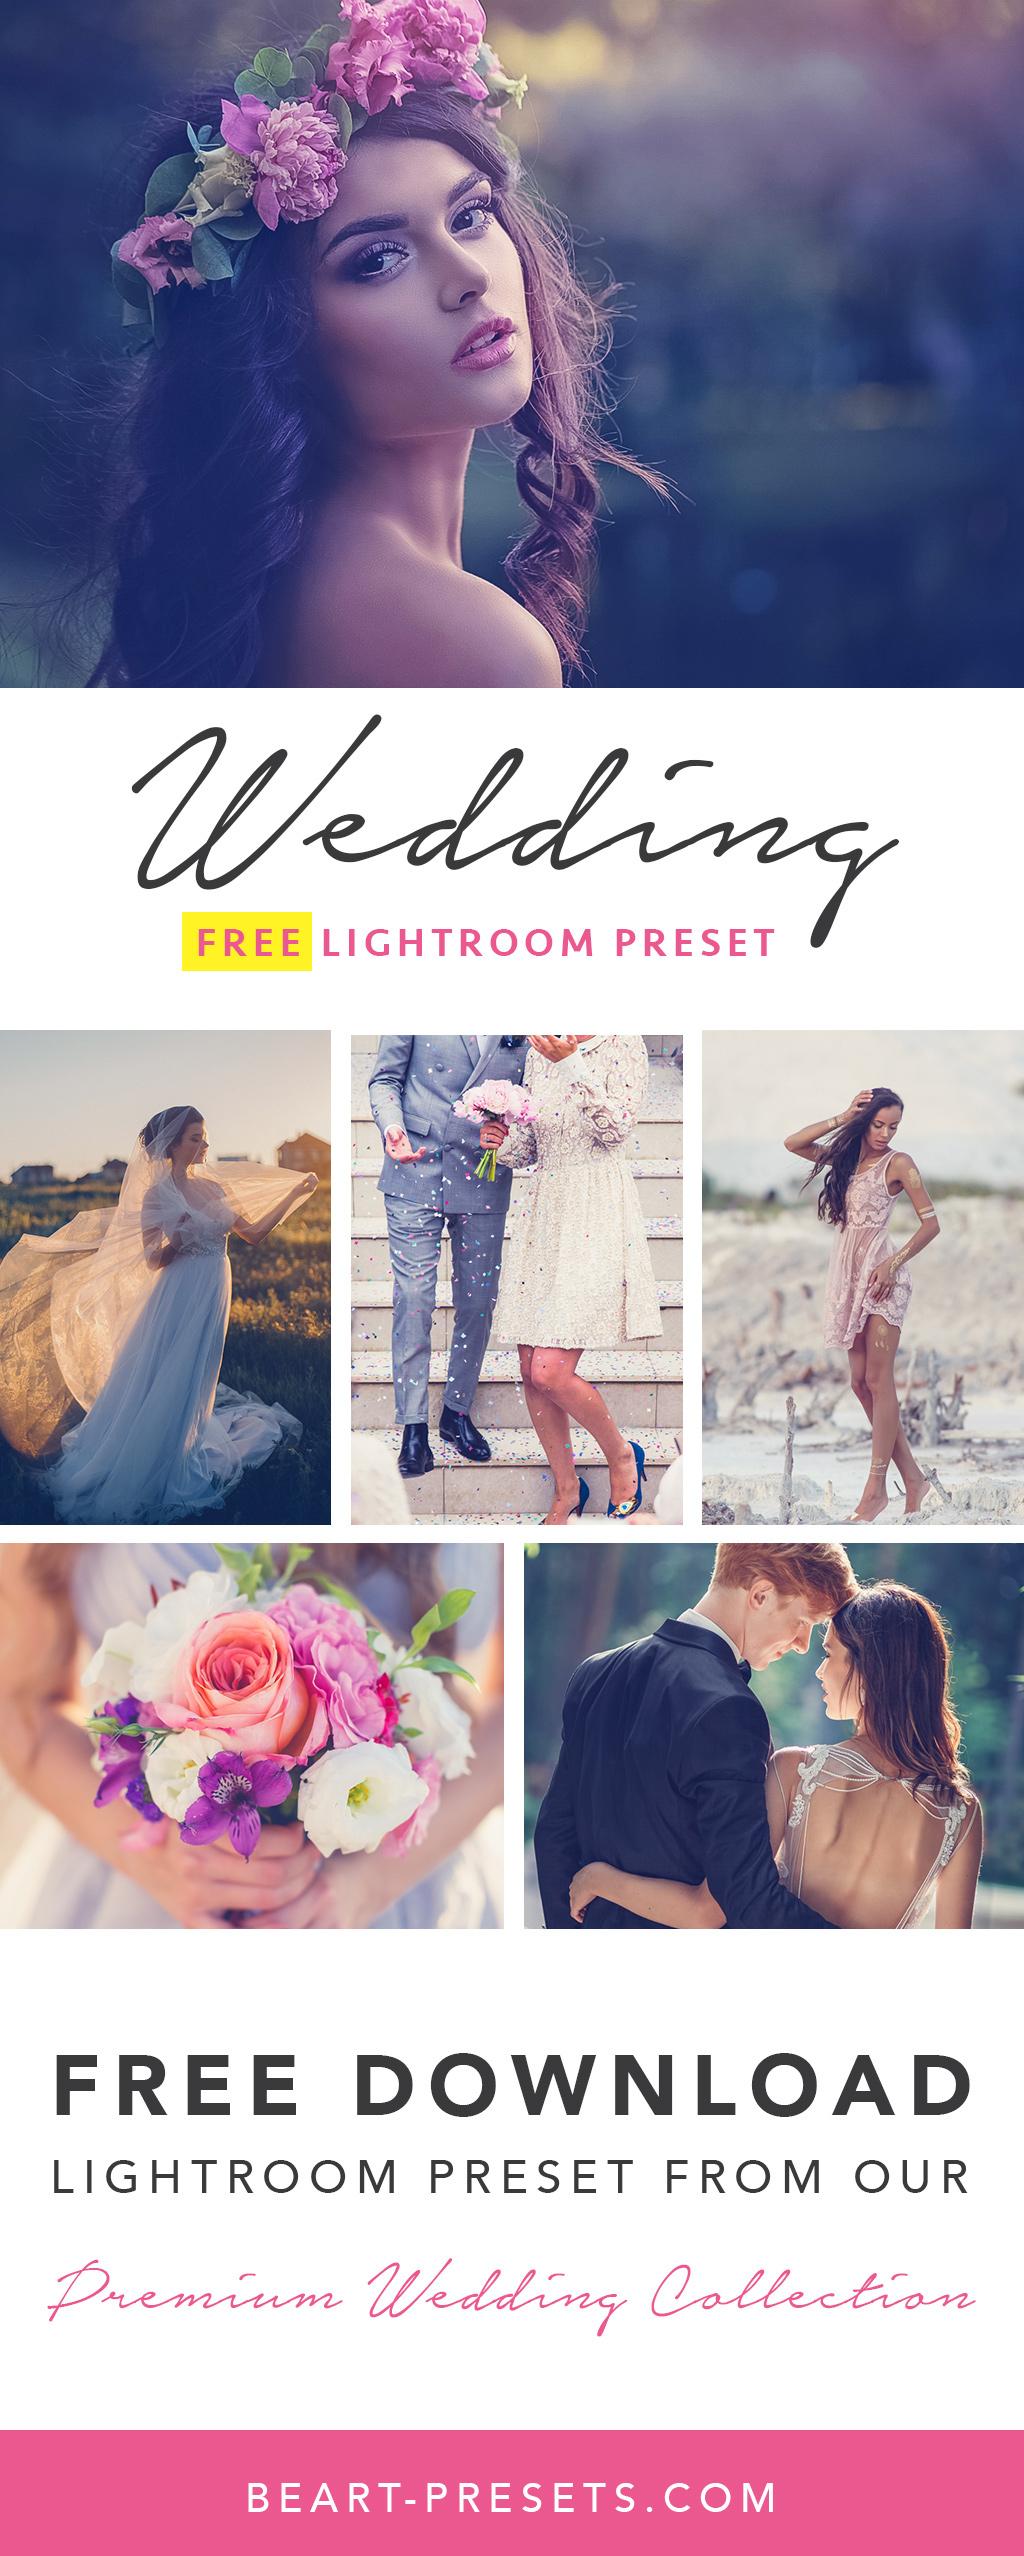 BEST FREE WEDDING LIGHTROOM PRESET DOWNLOAD on Behance